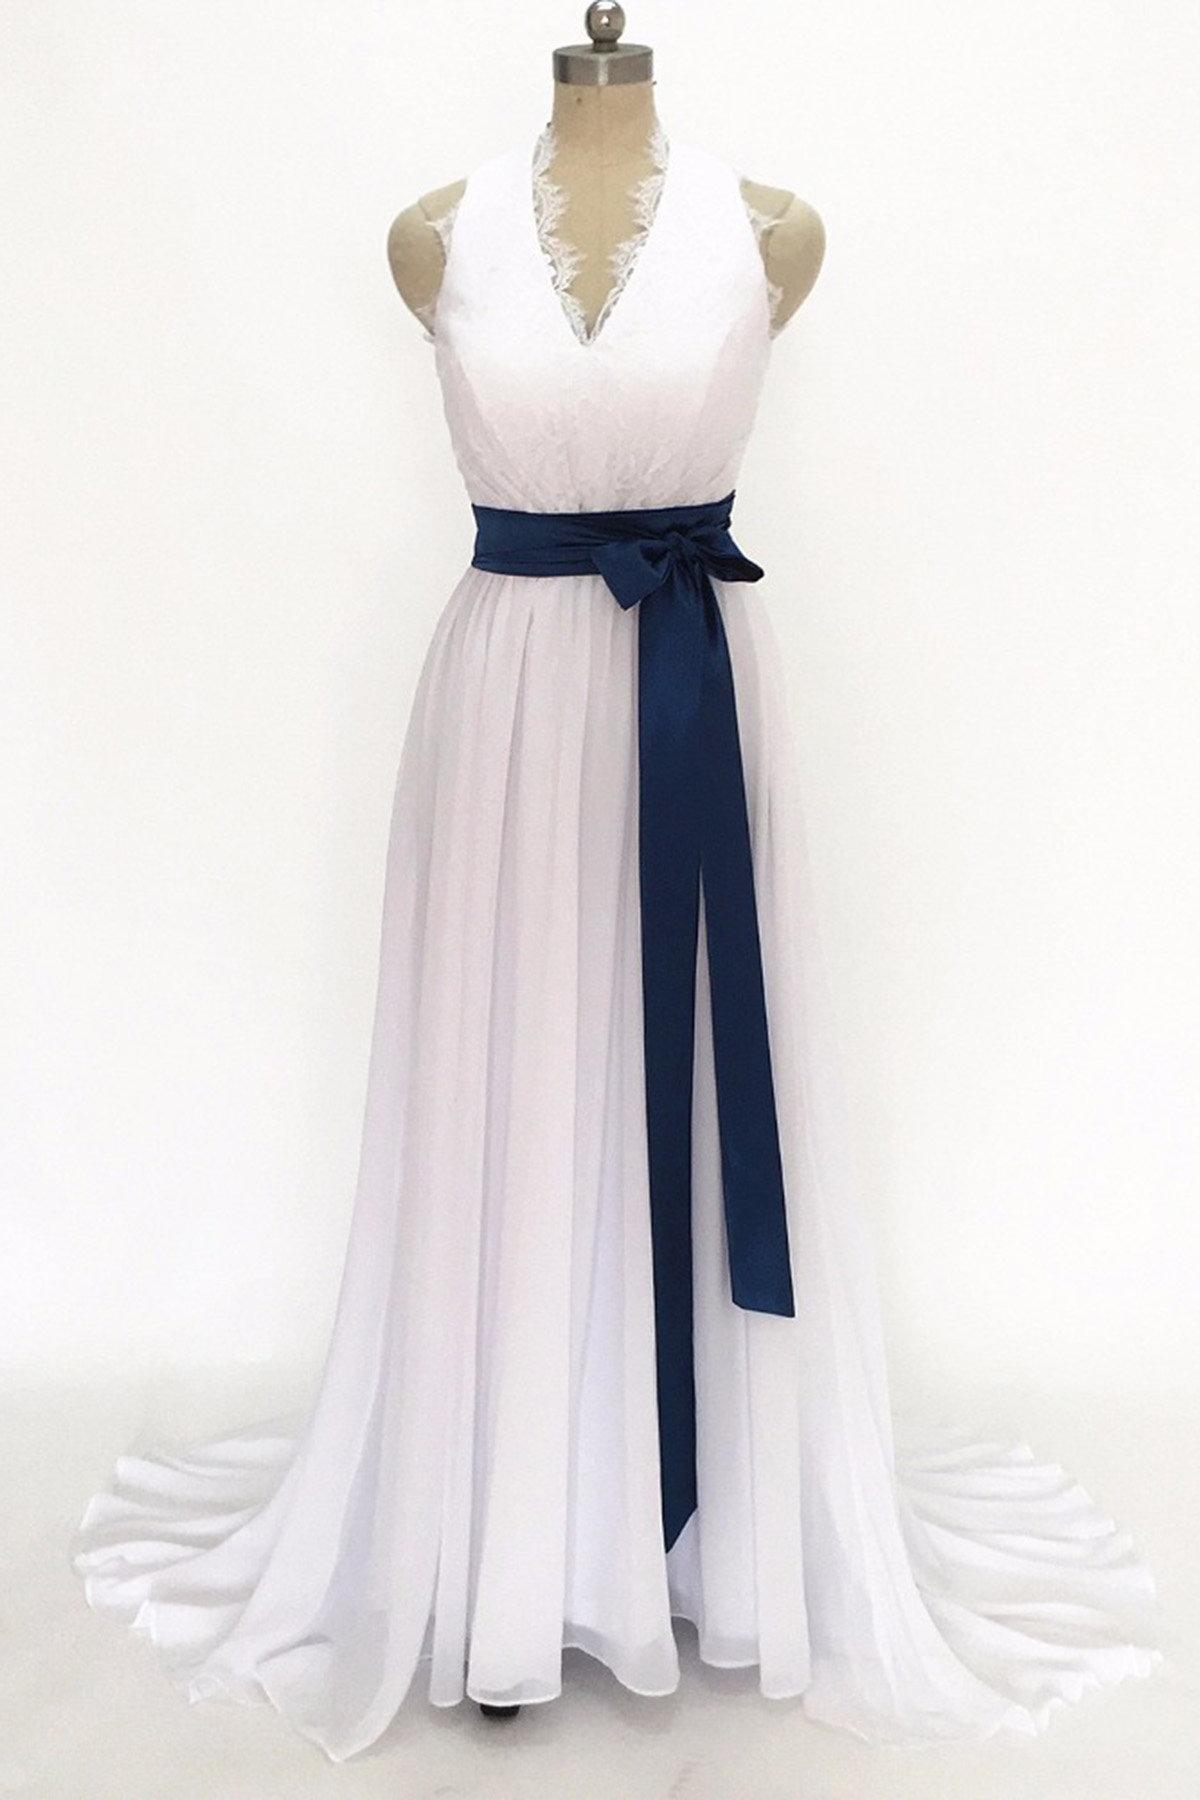 b01b9d2d9375 Simple White Chiffon V Neck Long Prom Dress, Bridesmaid Dress ...